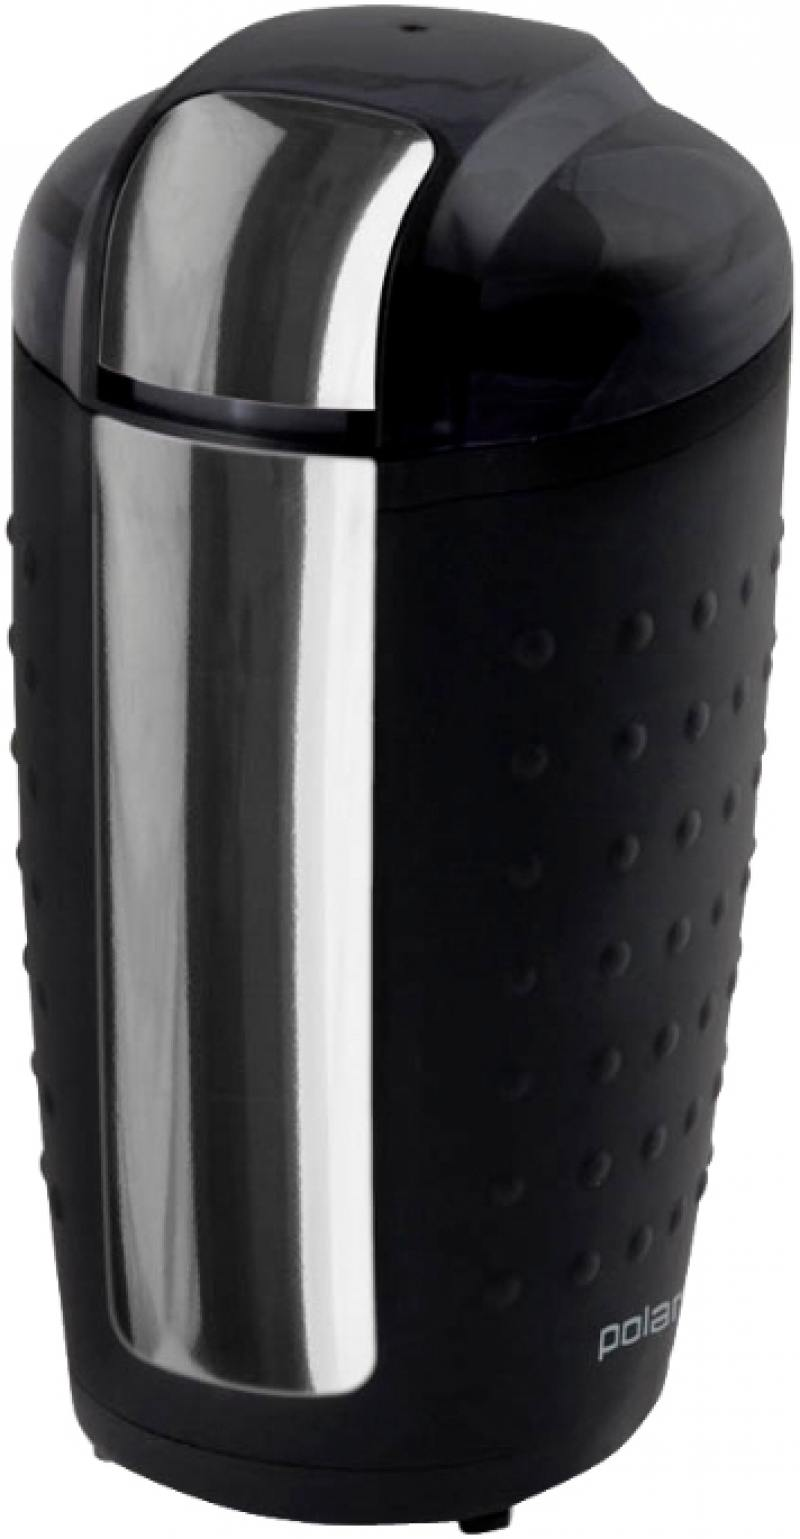 Кофемолка Polaris PCG 1420 200 Вт черный кофеварка polaris pcm 0210 450 вт черный